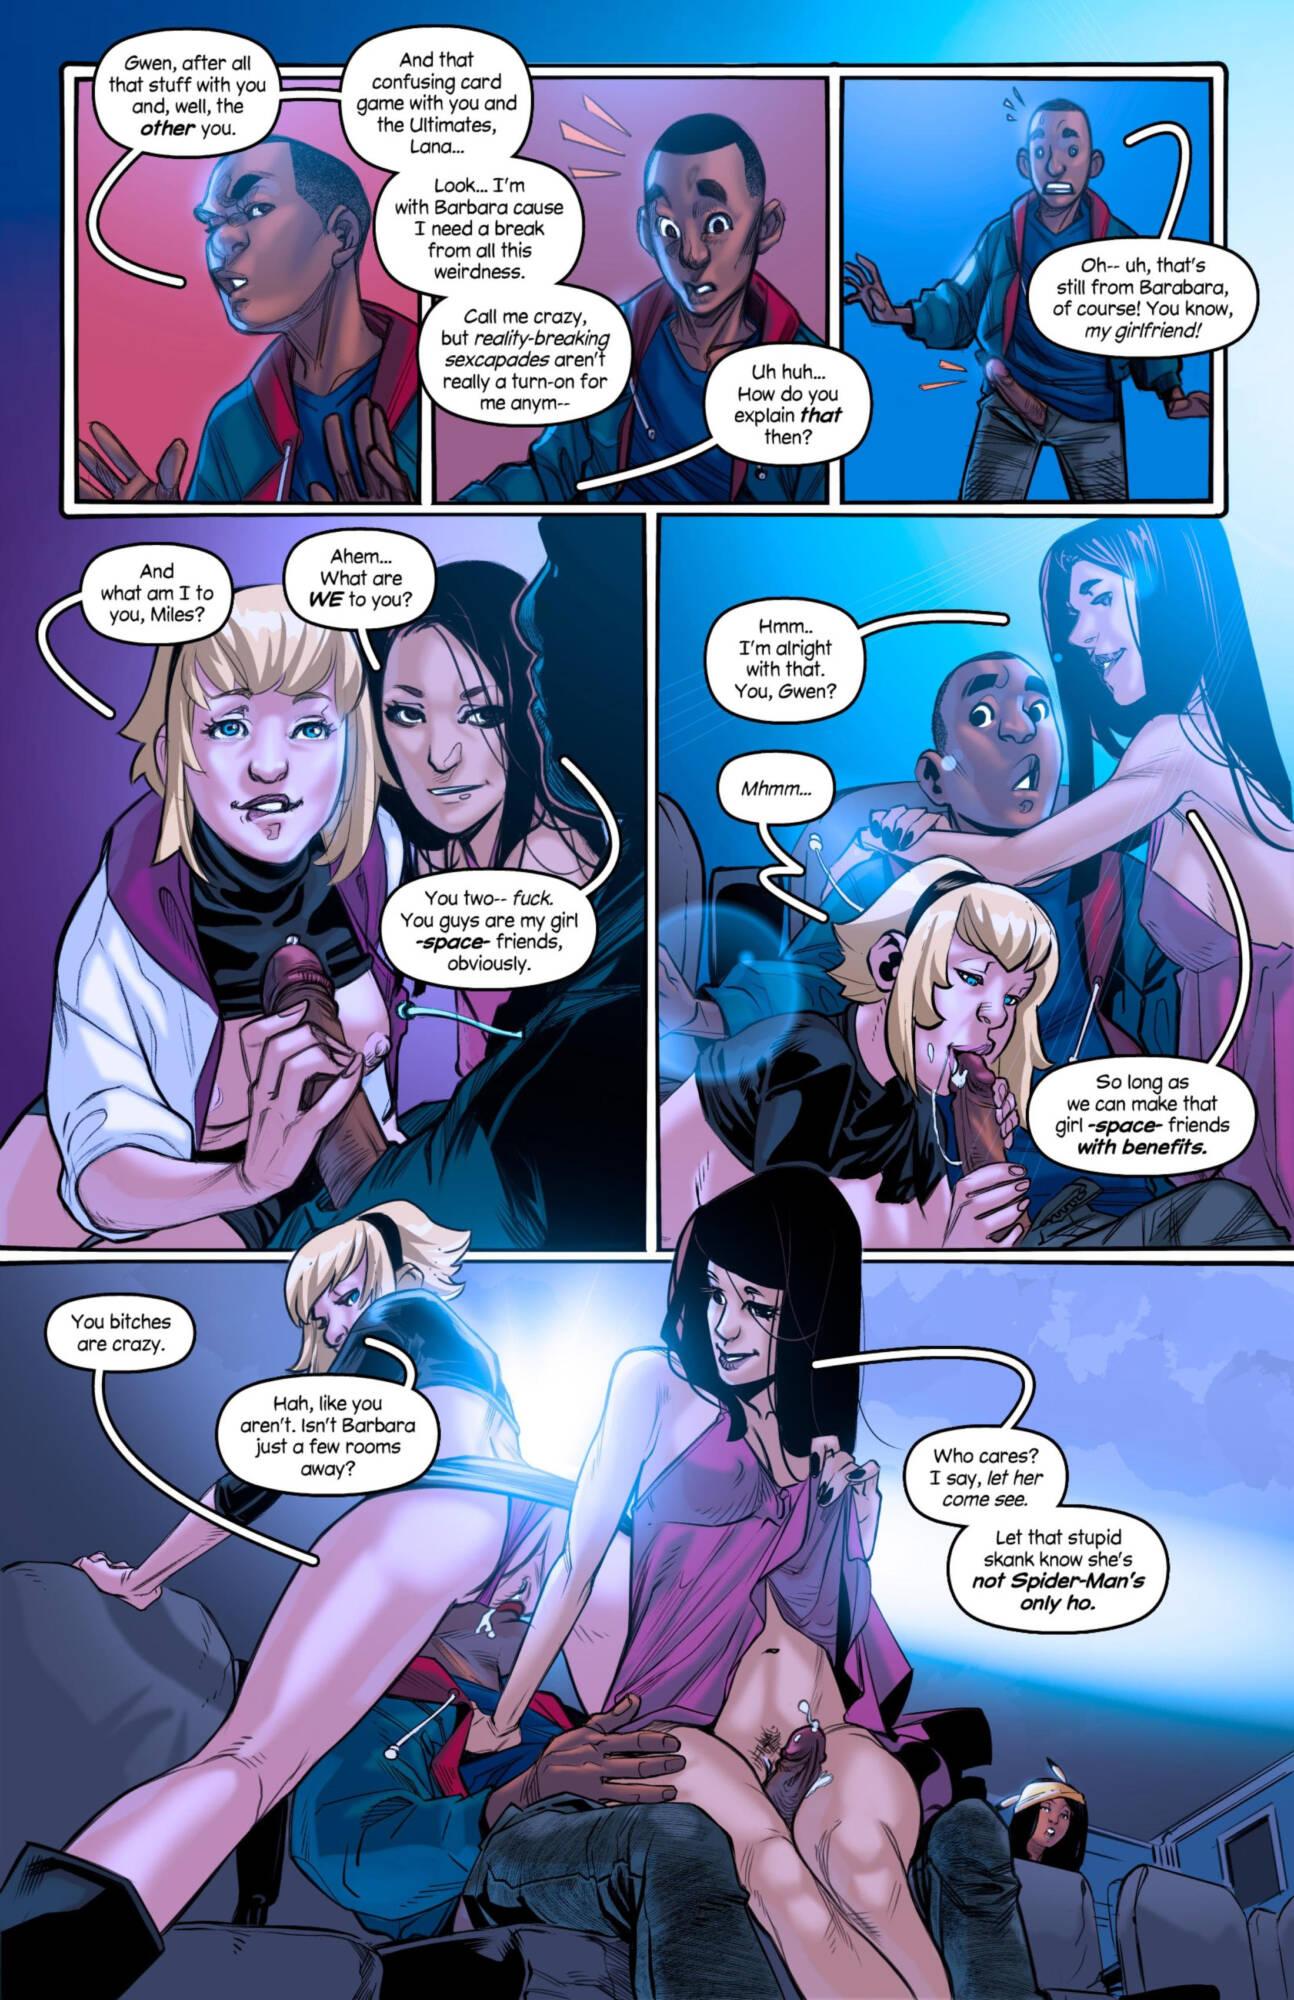 Weaving Fluids #4 (English) - page04 Marvel Universe,Spider-Man,  xxx porn rule34